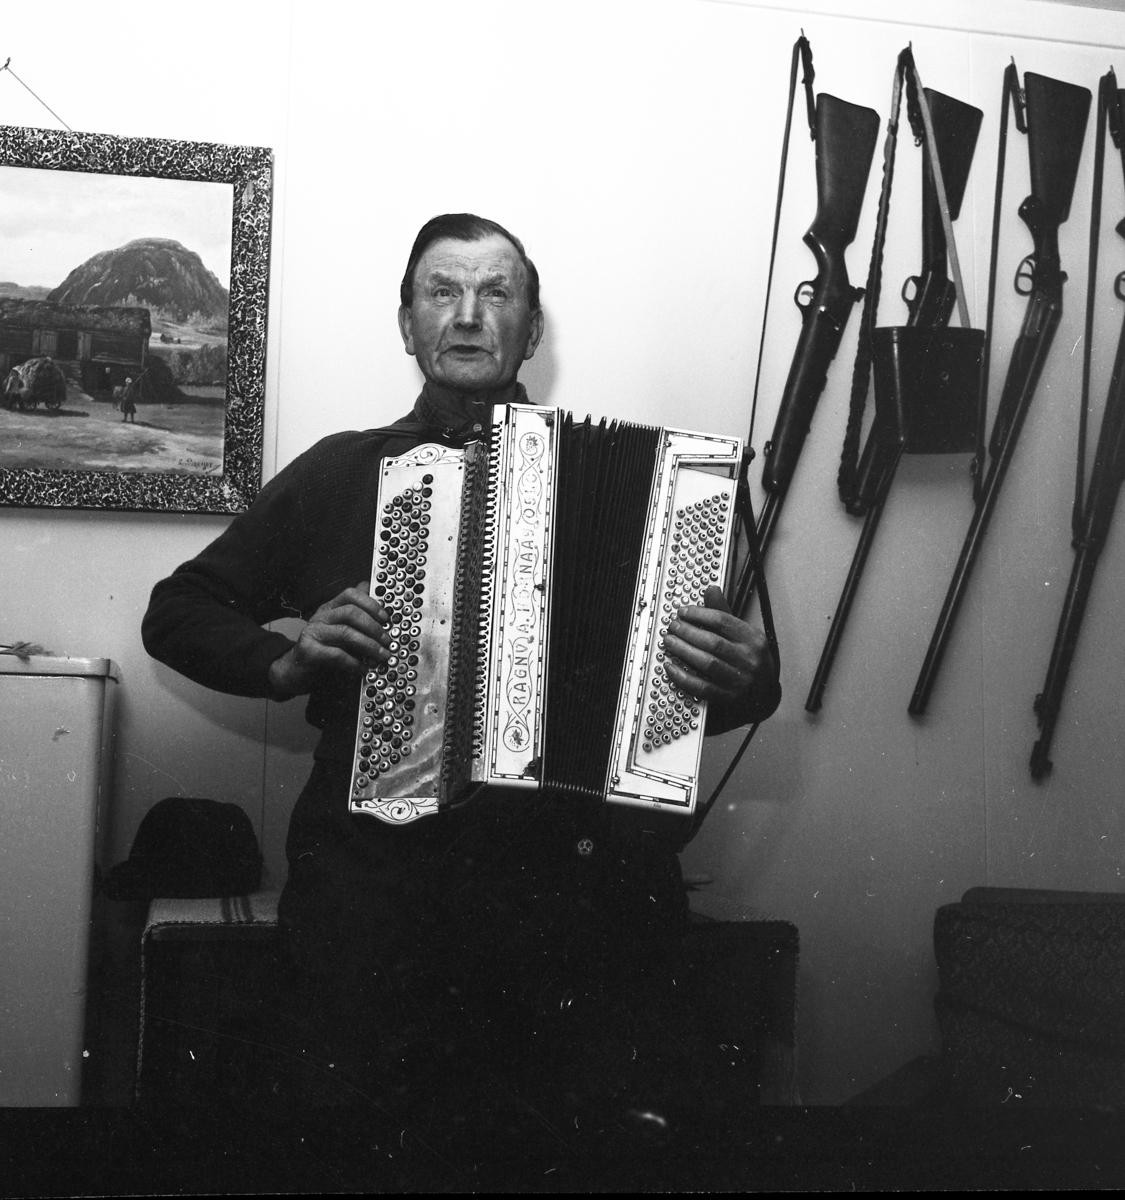 Johan Elsmo